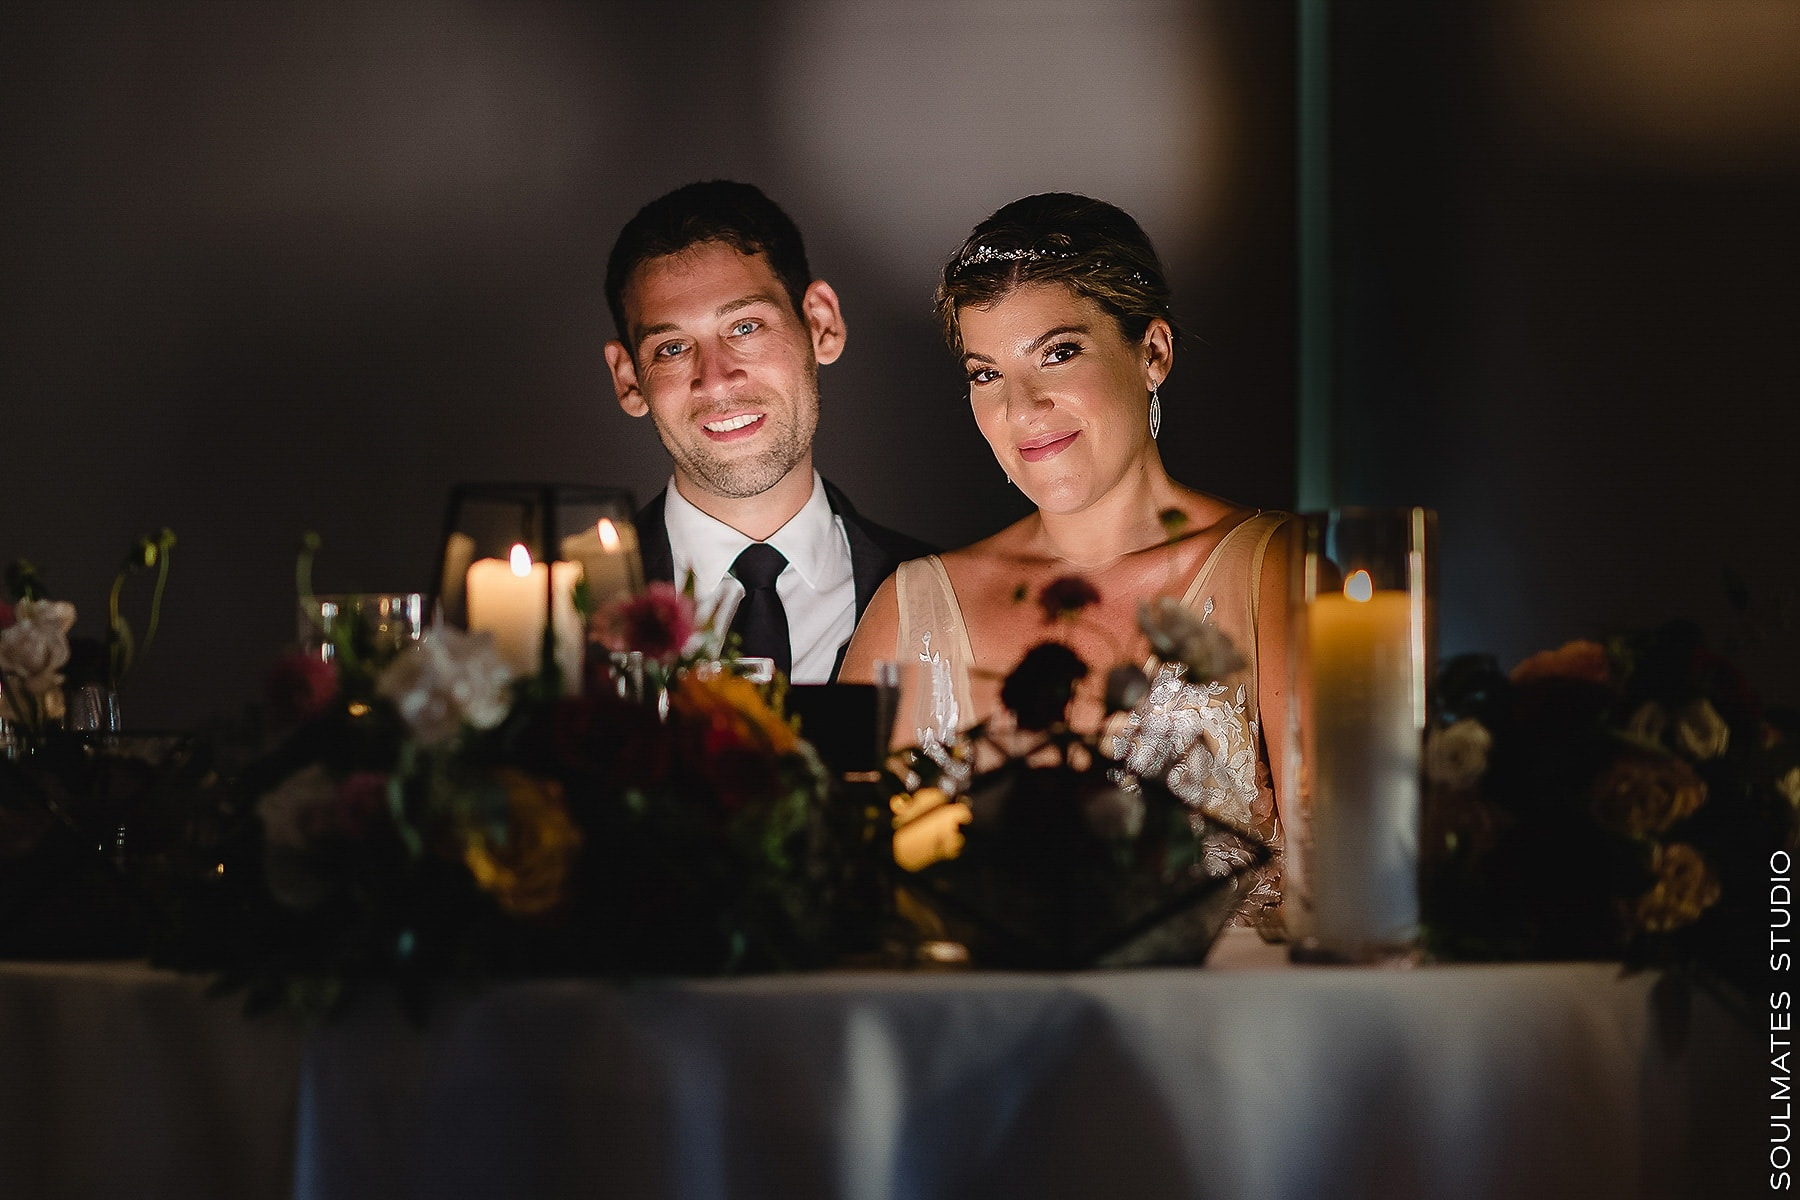 New Jersey Hyatt Regency Wedding Bride and Groom Portrait